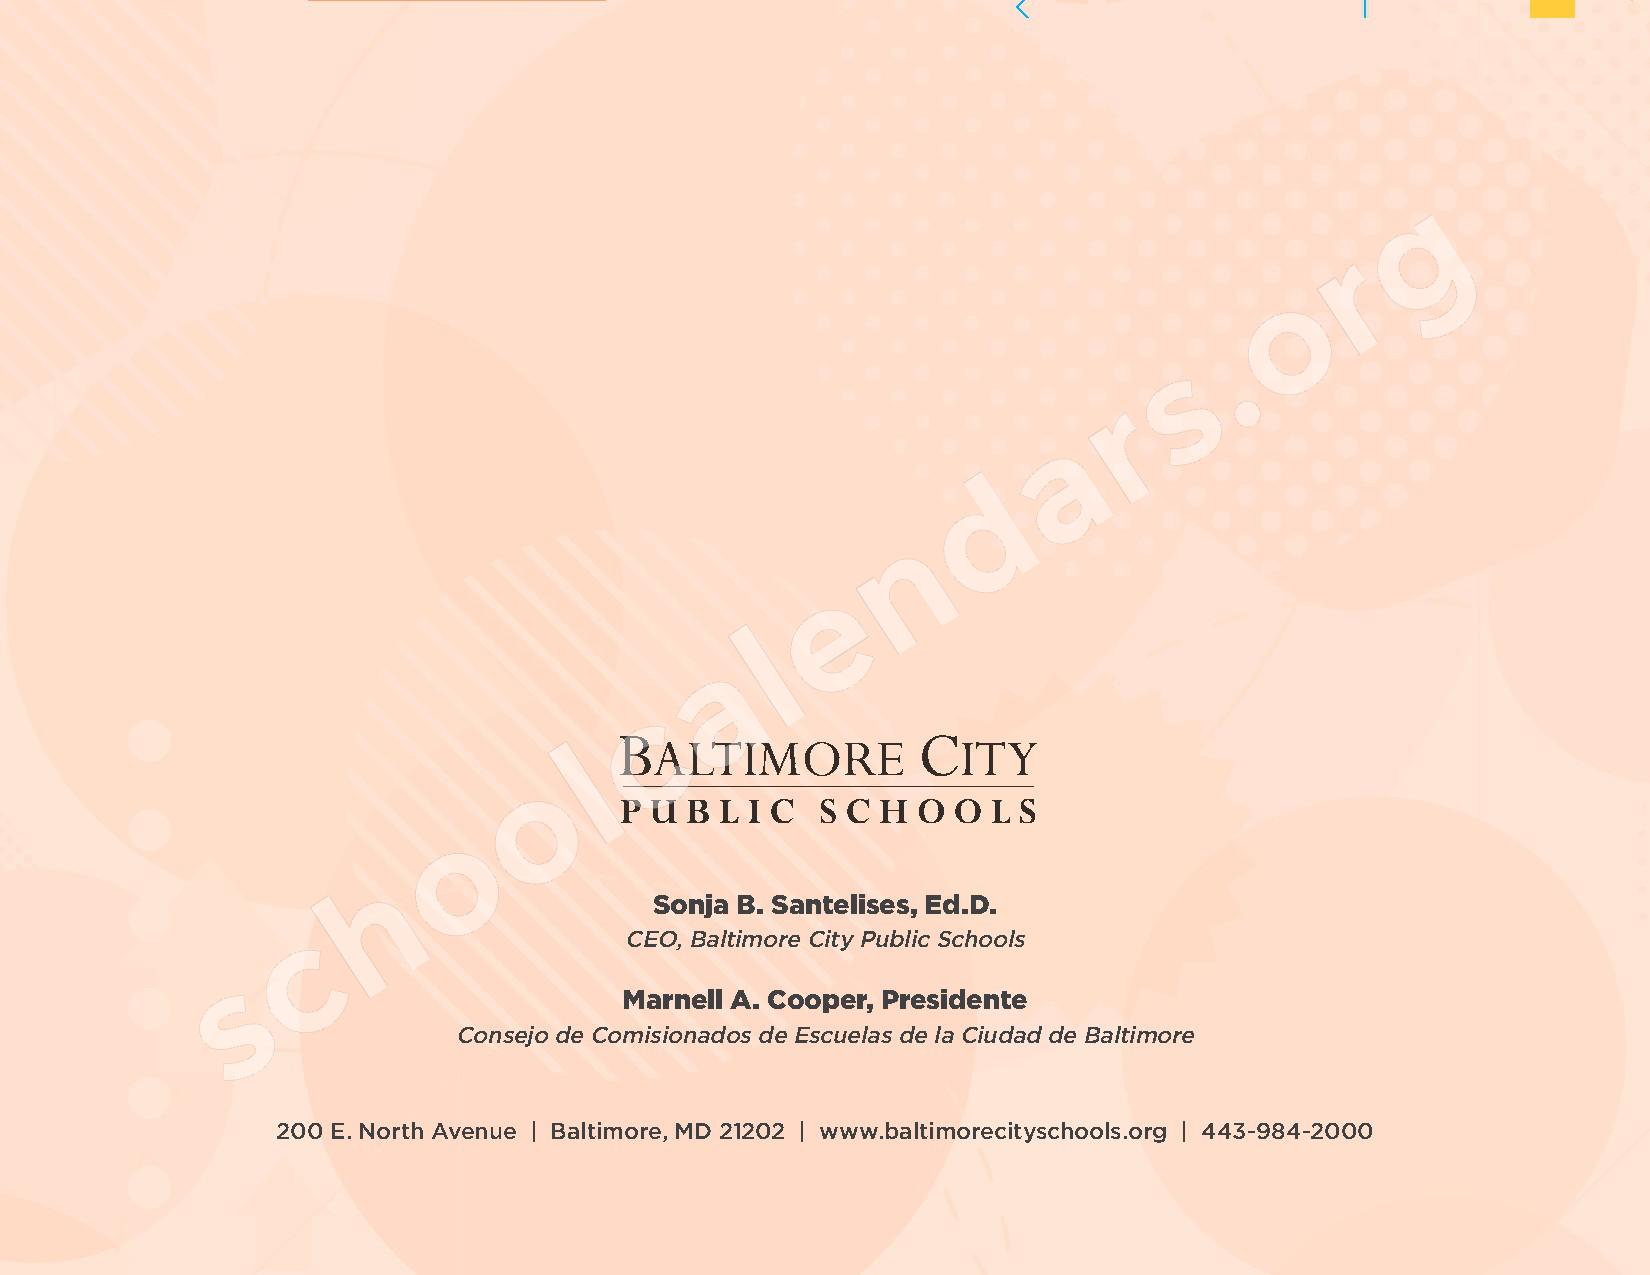 2016 - 2017 Calendario Escolar – Belmont Elementary School – page 16